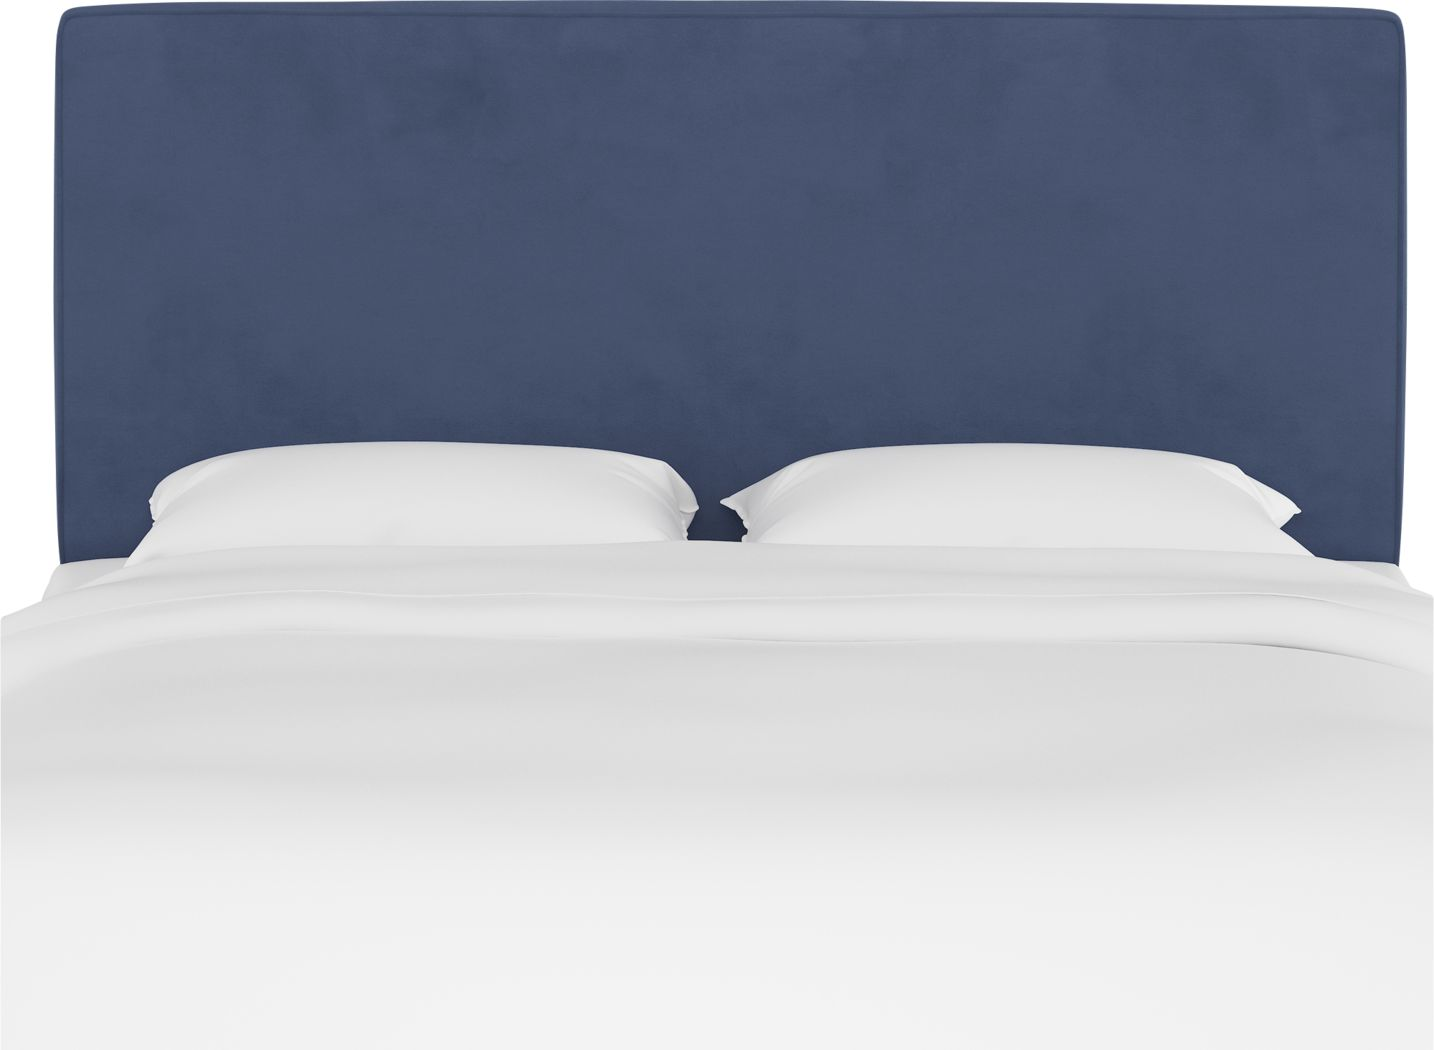 Tangere Blue Queen Upholstered Headboard